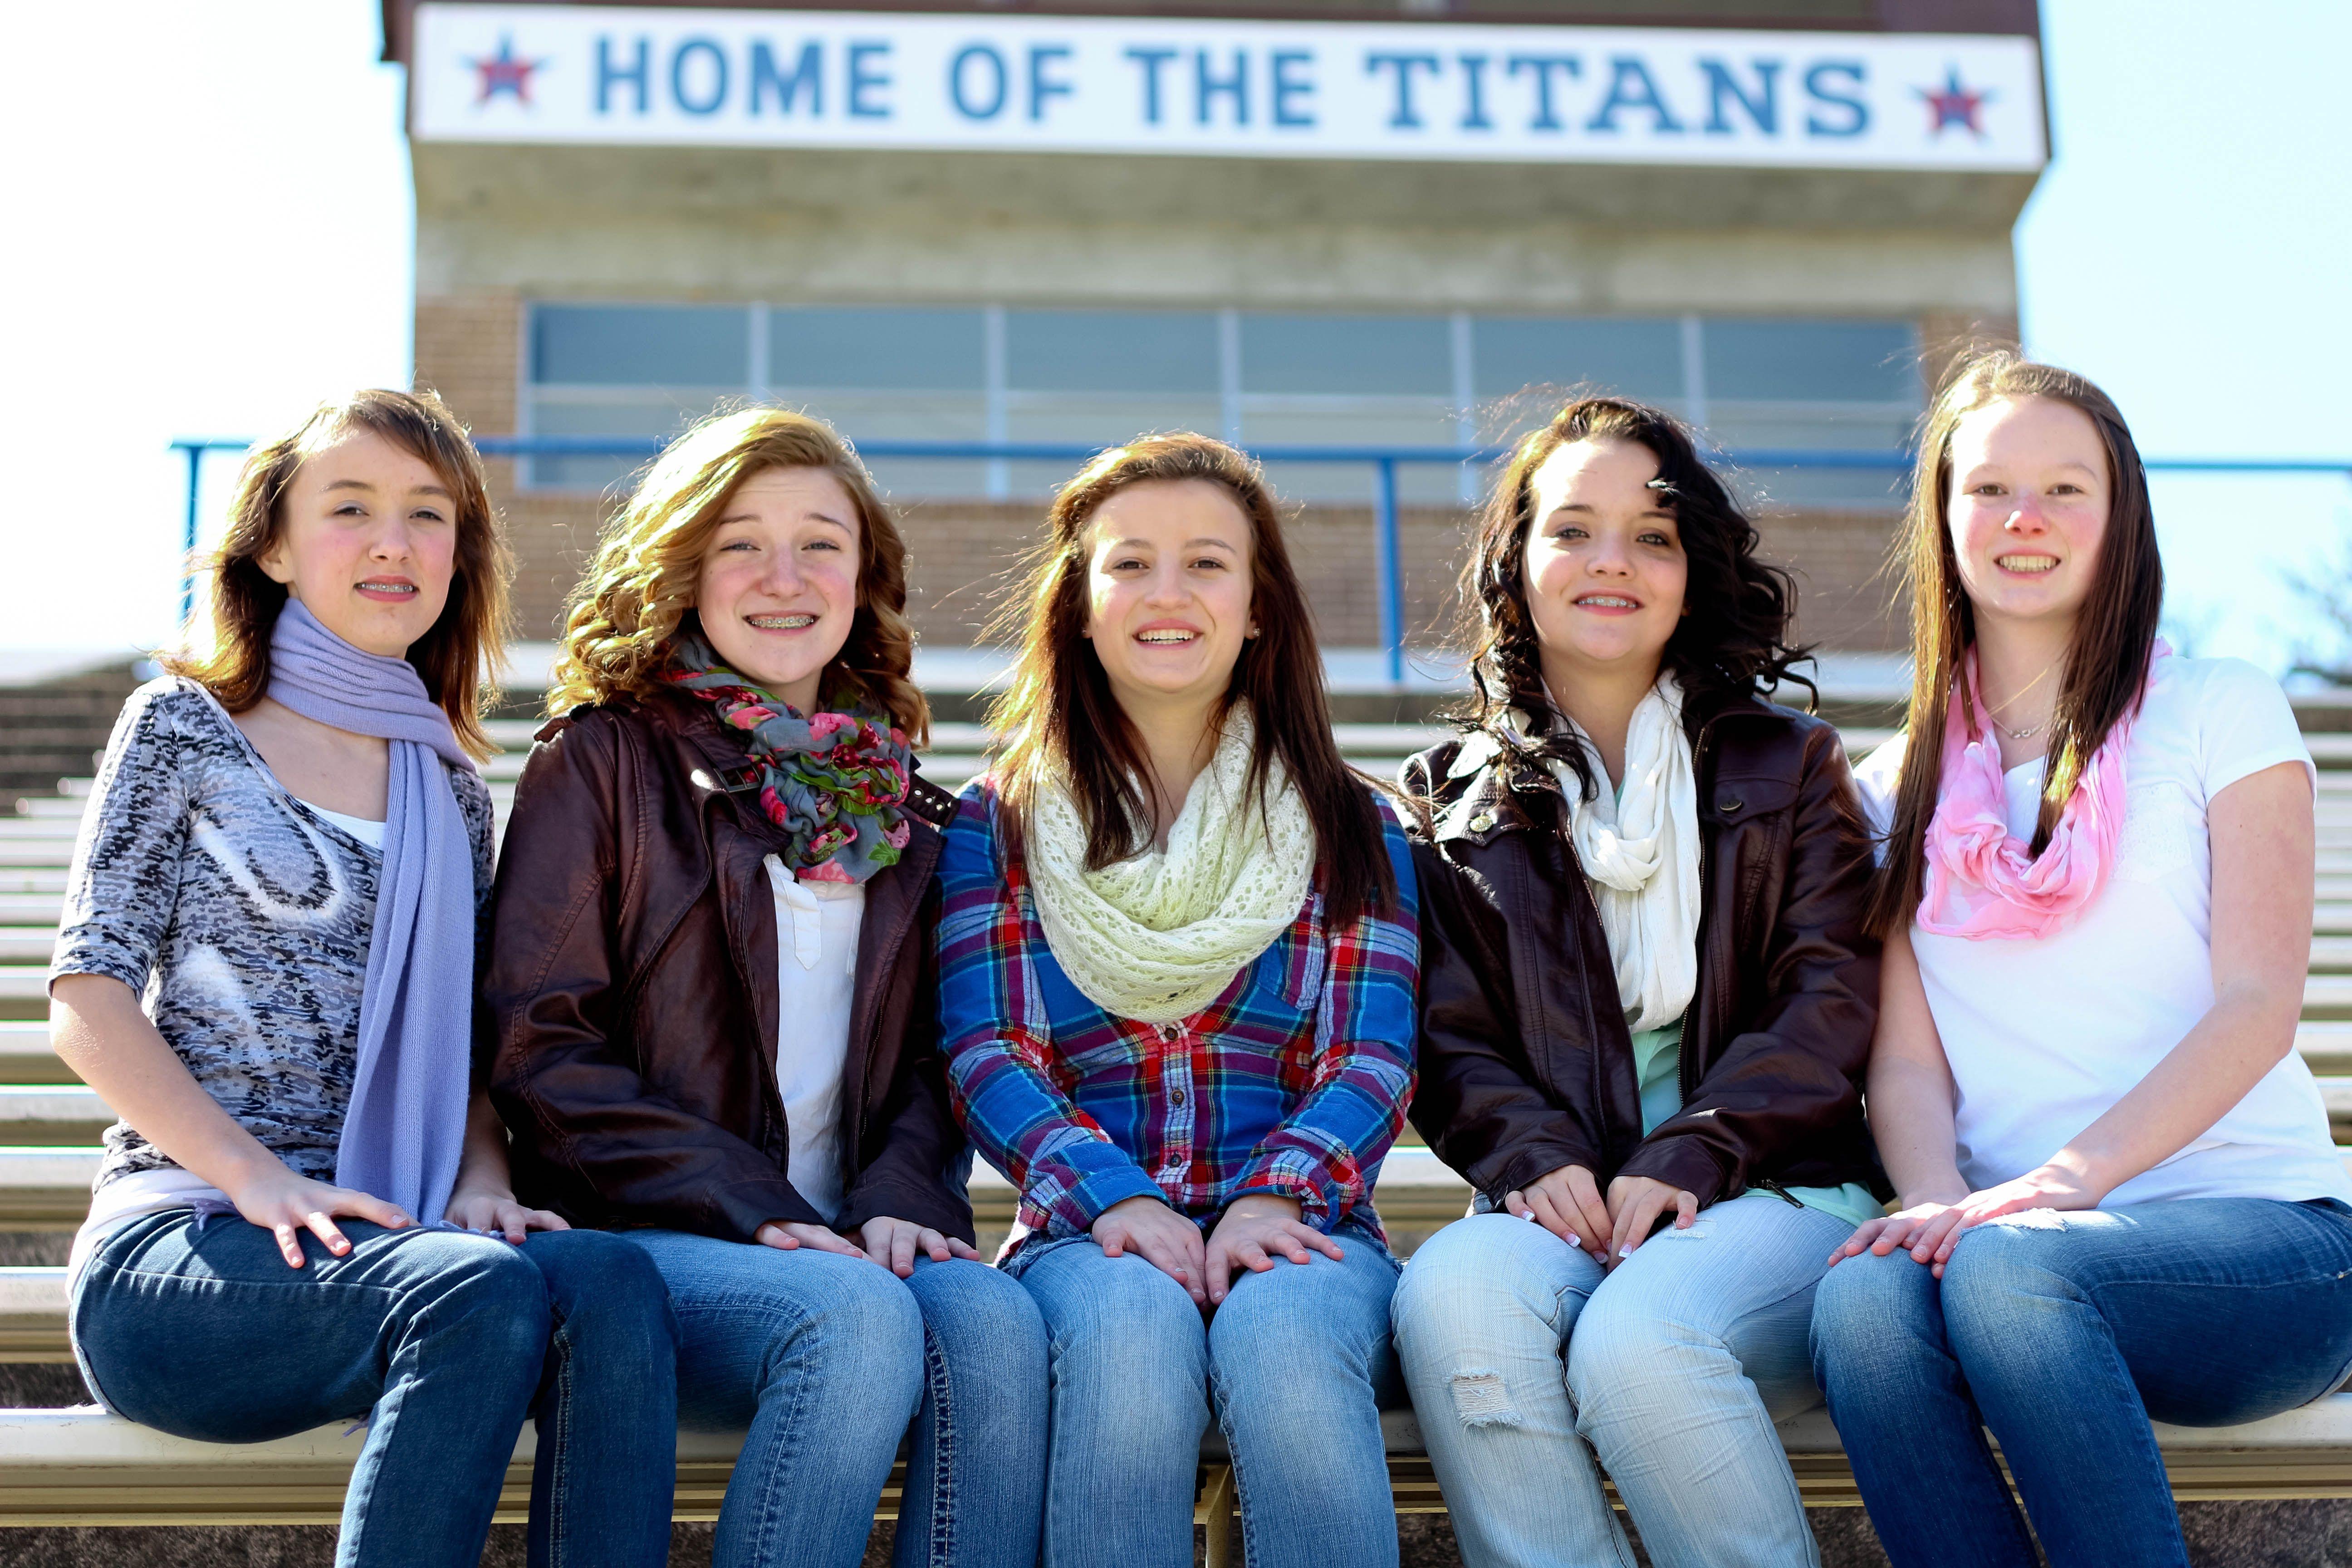 teen girls best friends cheerleaders